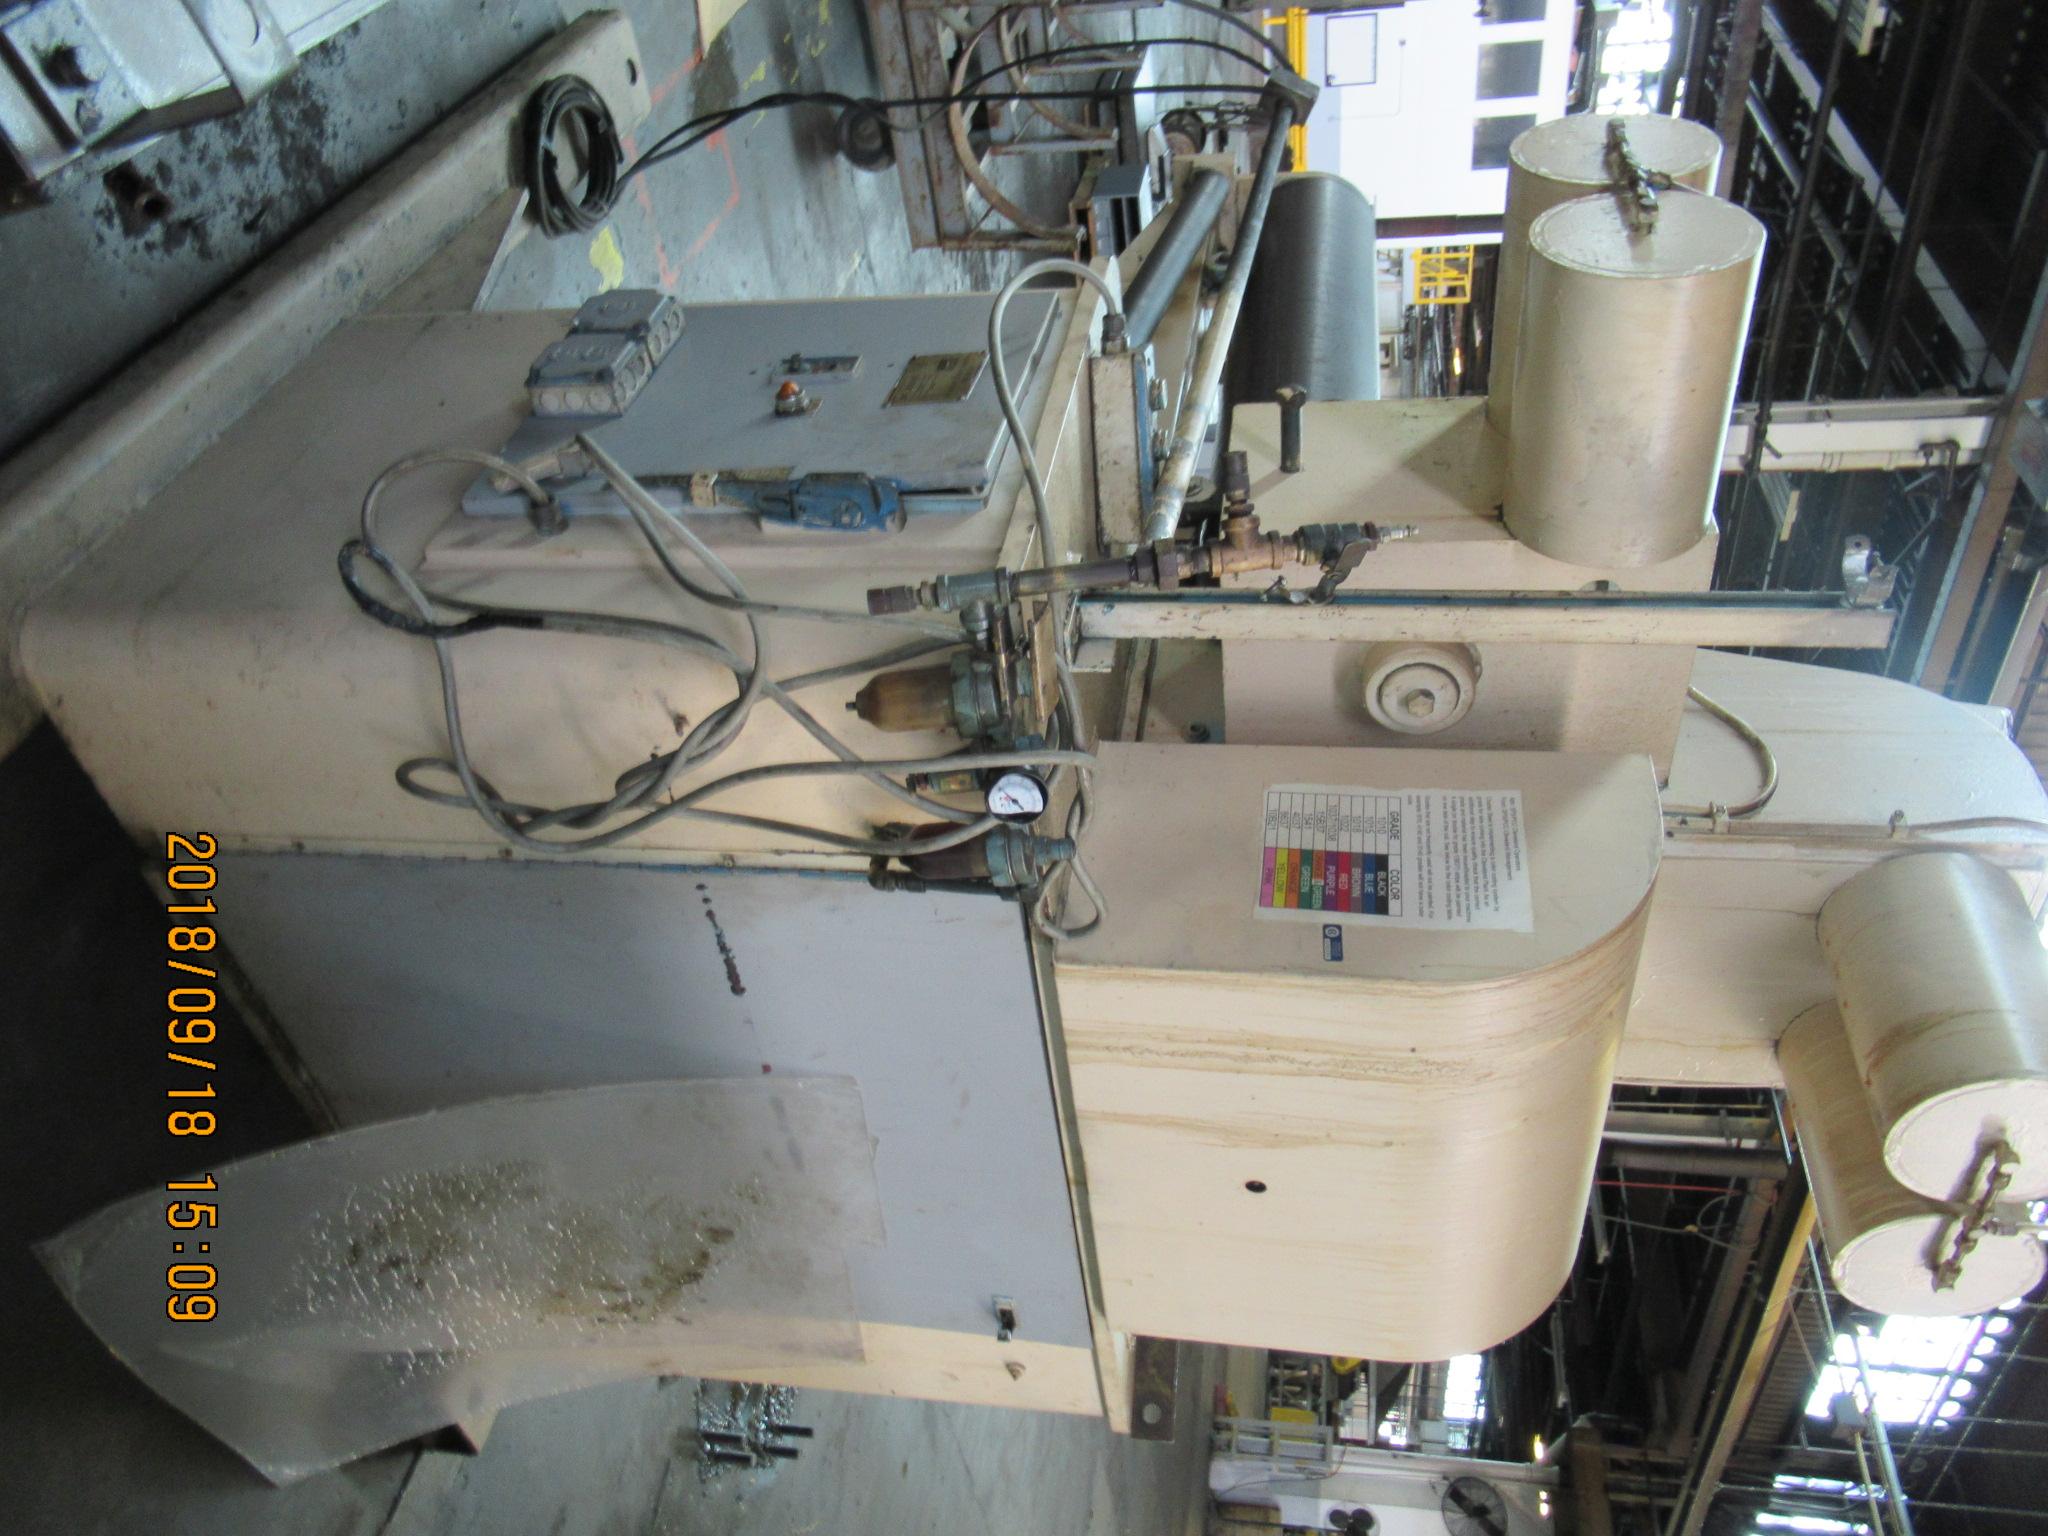 RMG Model 2024-01 Powered Uncoiler